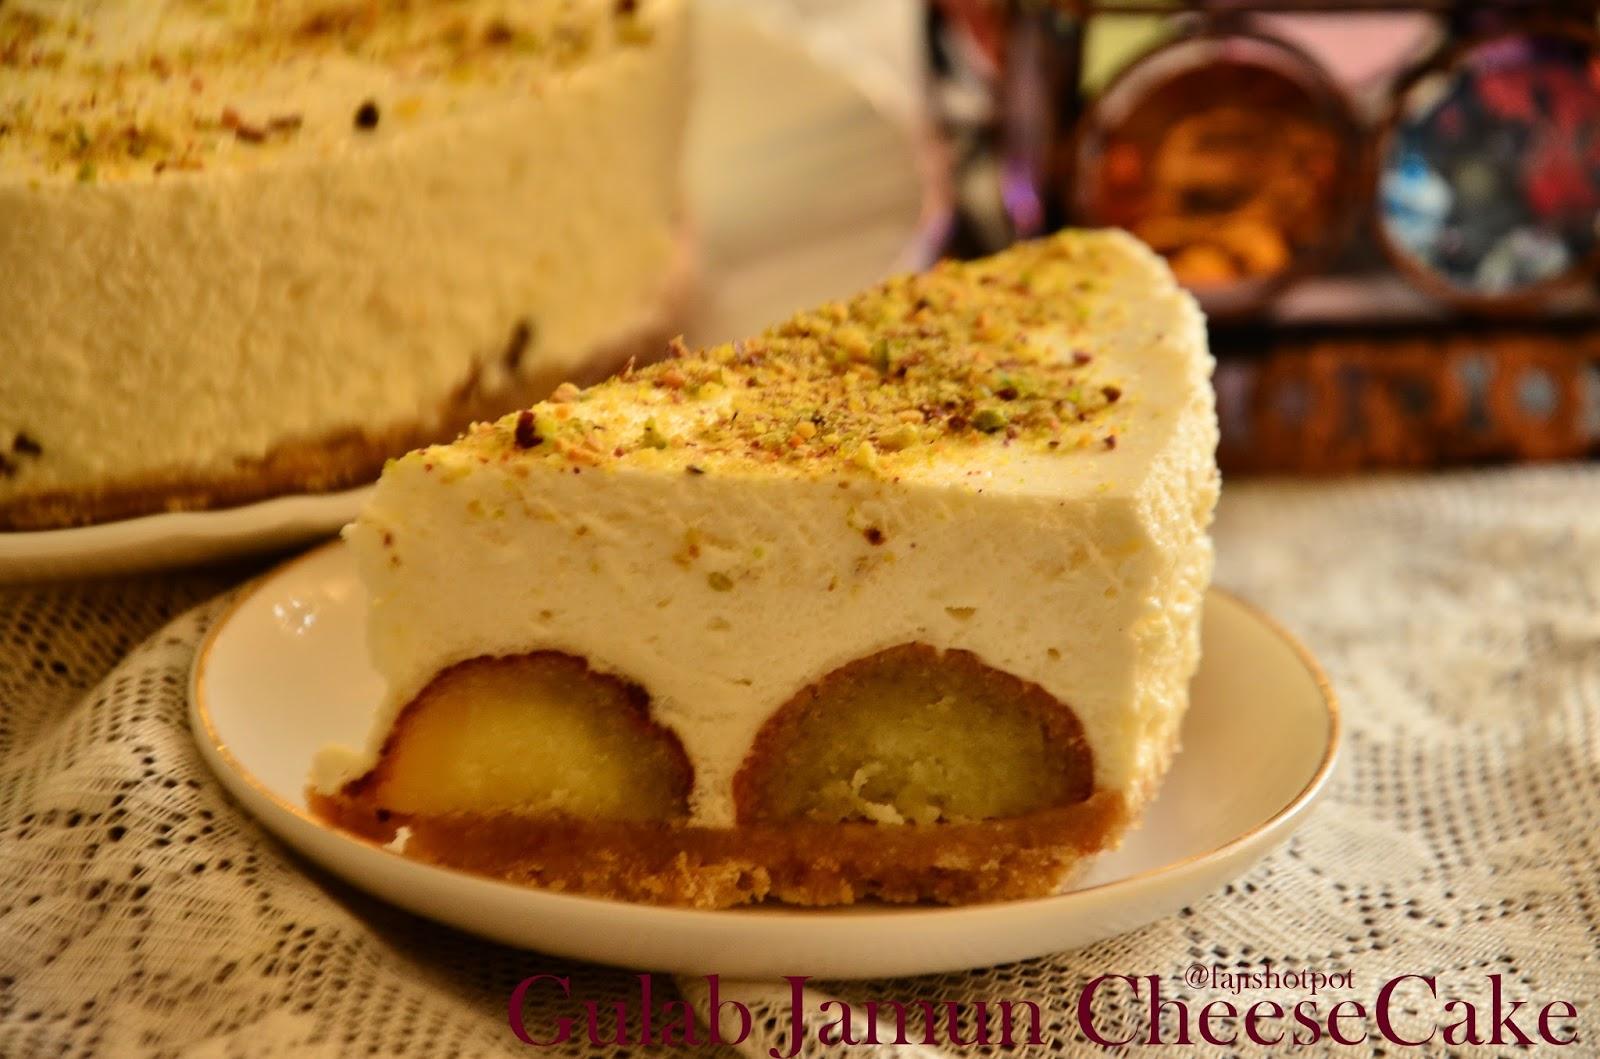 Fajis Hot Pot Gulab Jamun CheeseCake 200th Post